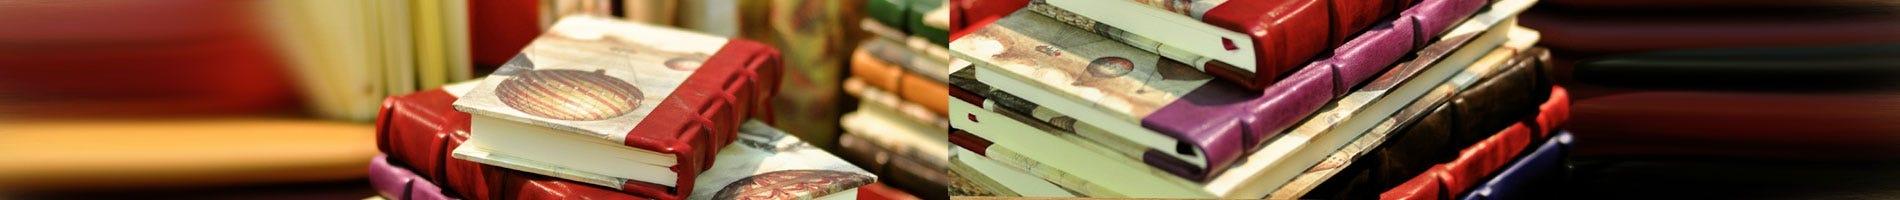 bomo art leather spine journals